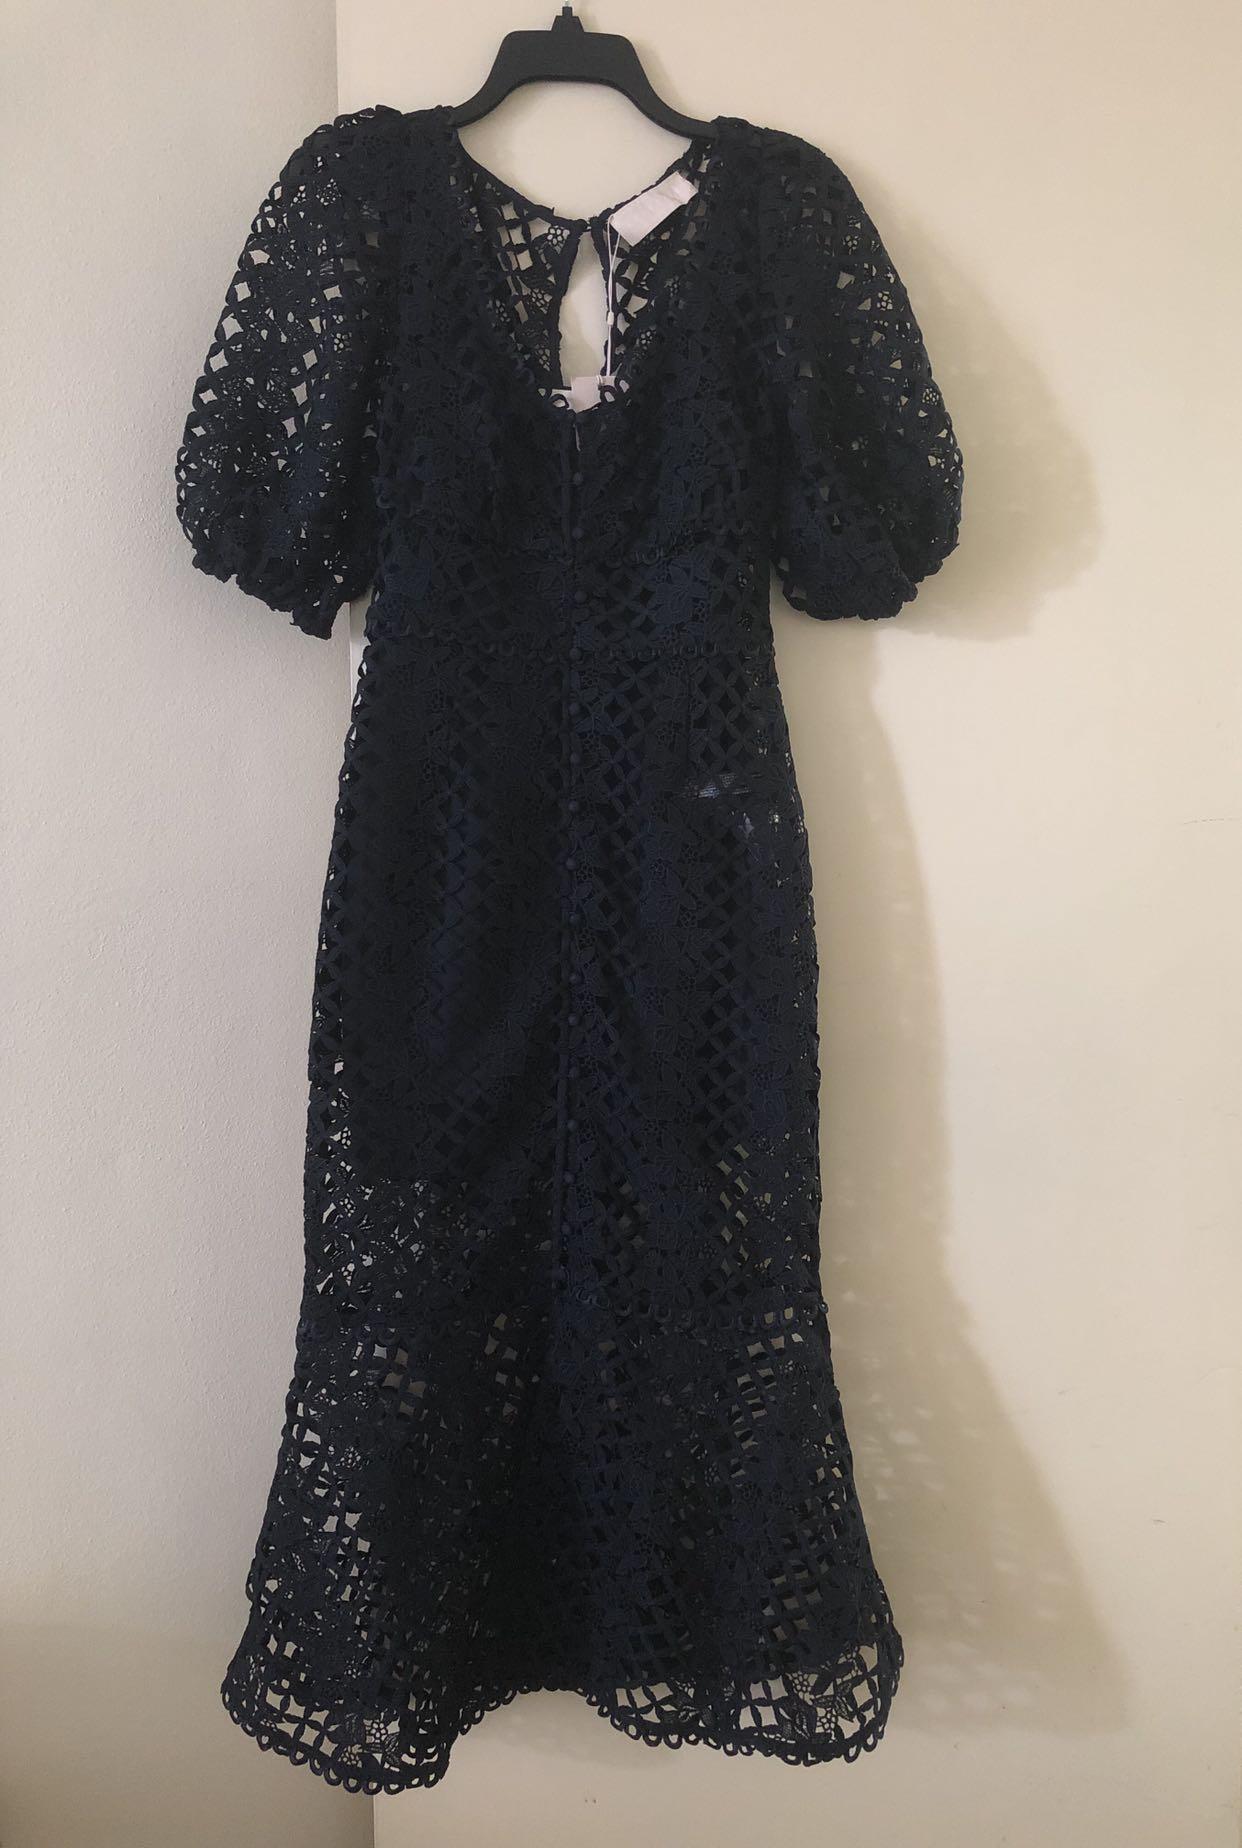 Keepsake Lace Midi Dress Size XS/AU UK 6/US 0-2 (Navy)